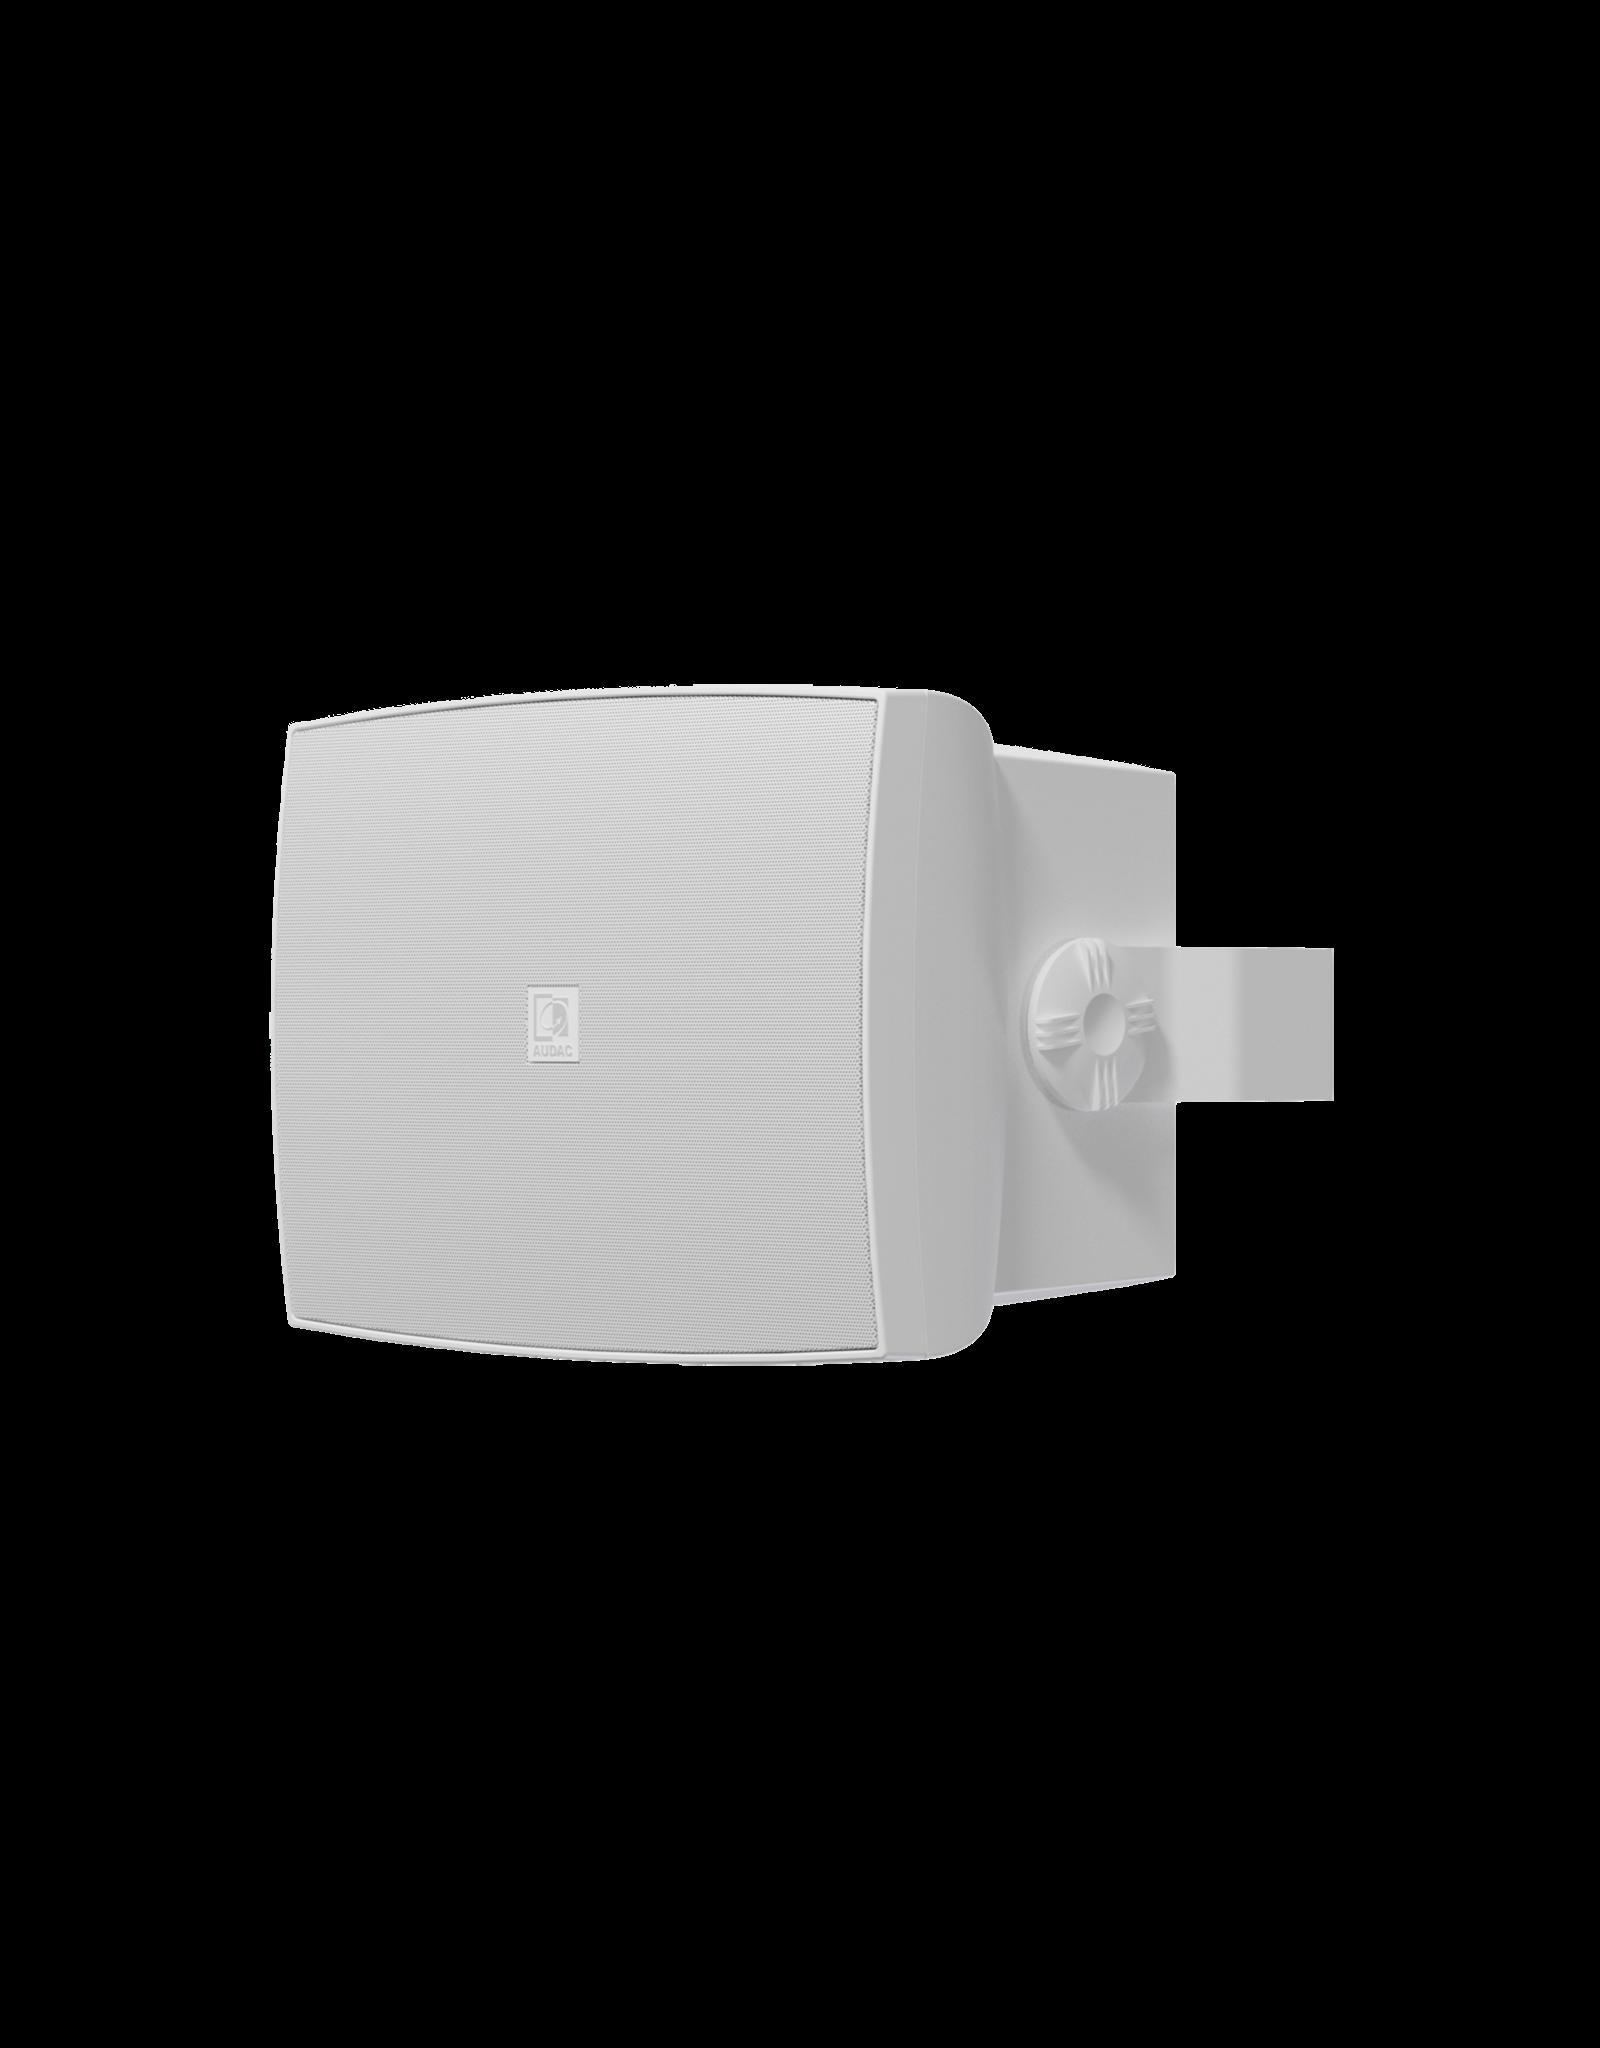 "Audac Universal wall speaker 8"" Black version"